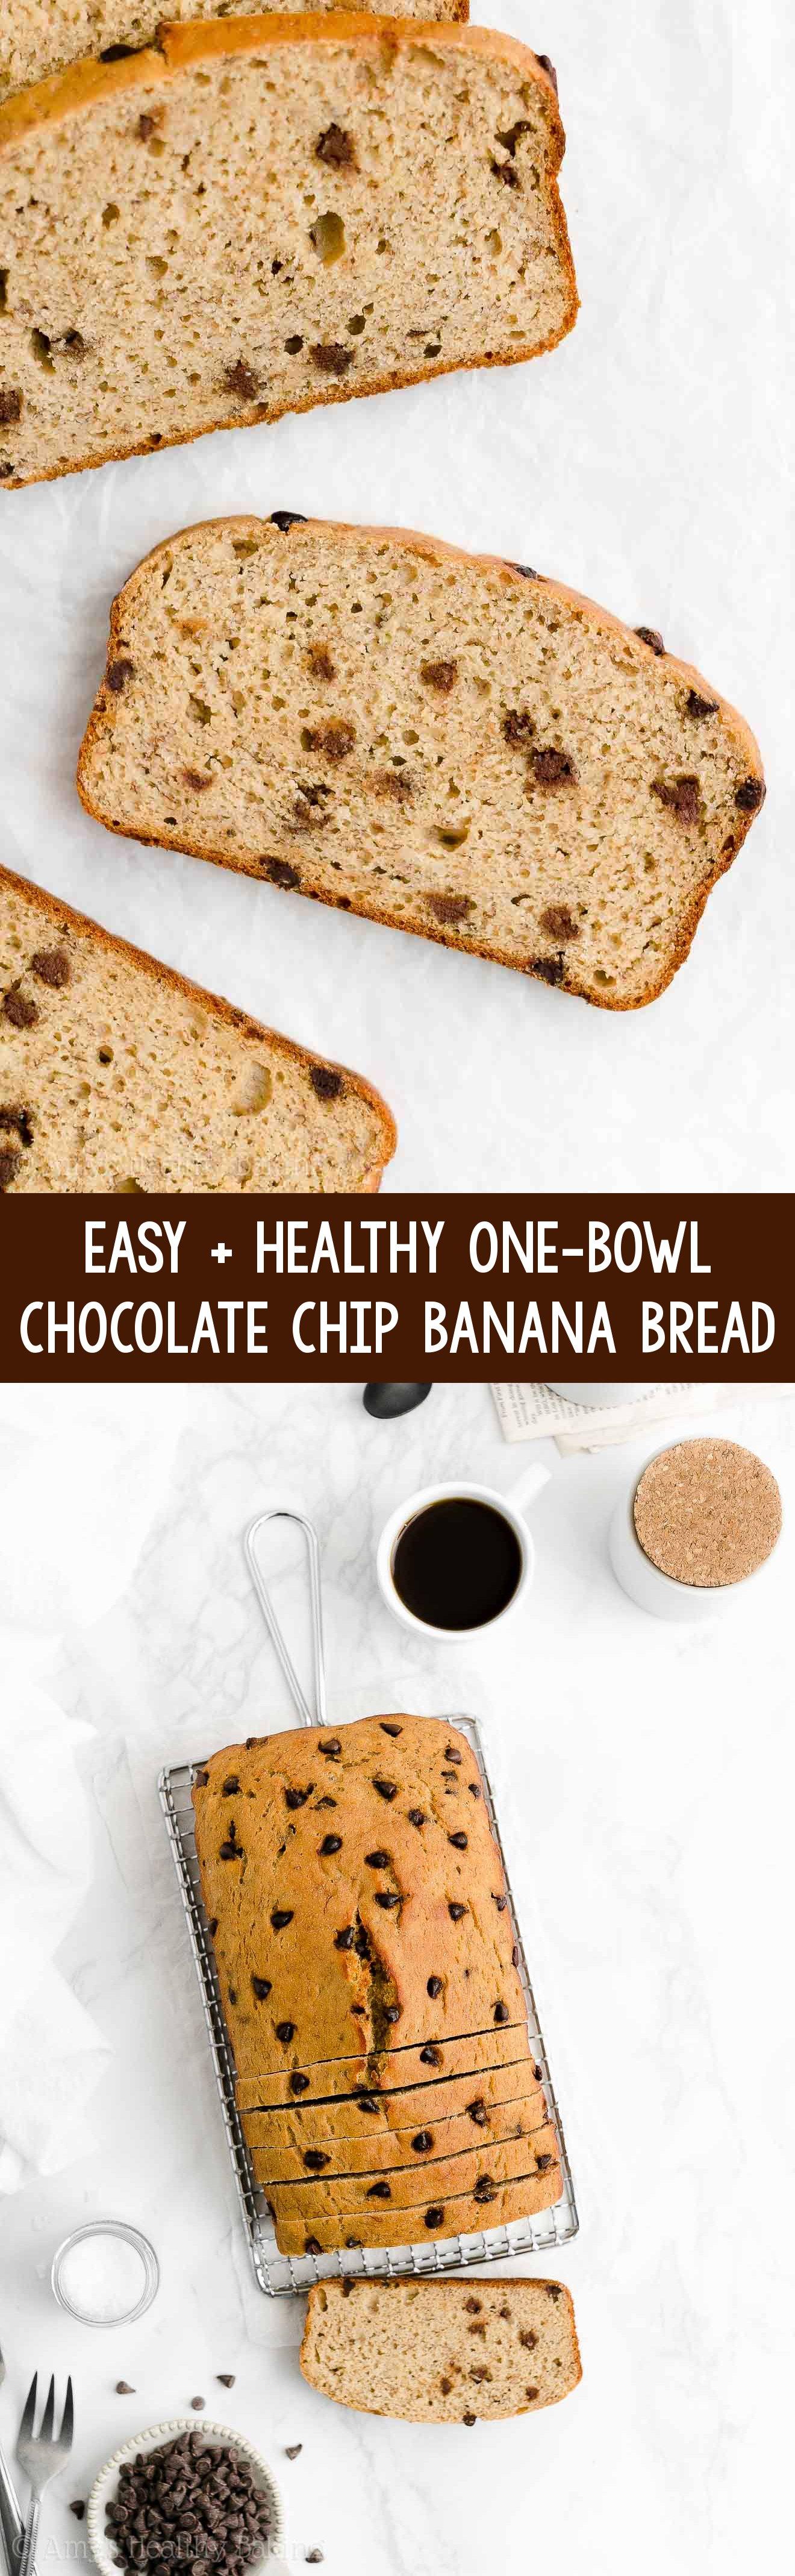 Best Easy One-Bowl Healthy Greek Yogurt No Sugar Chocolate Chip Banana Bread